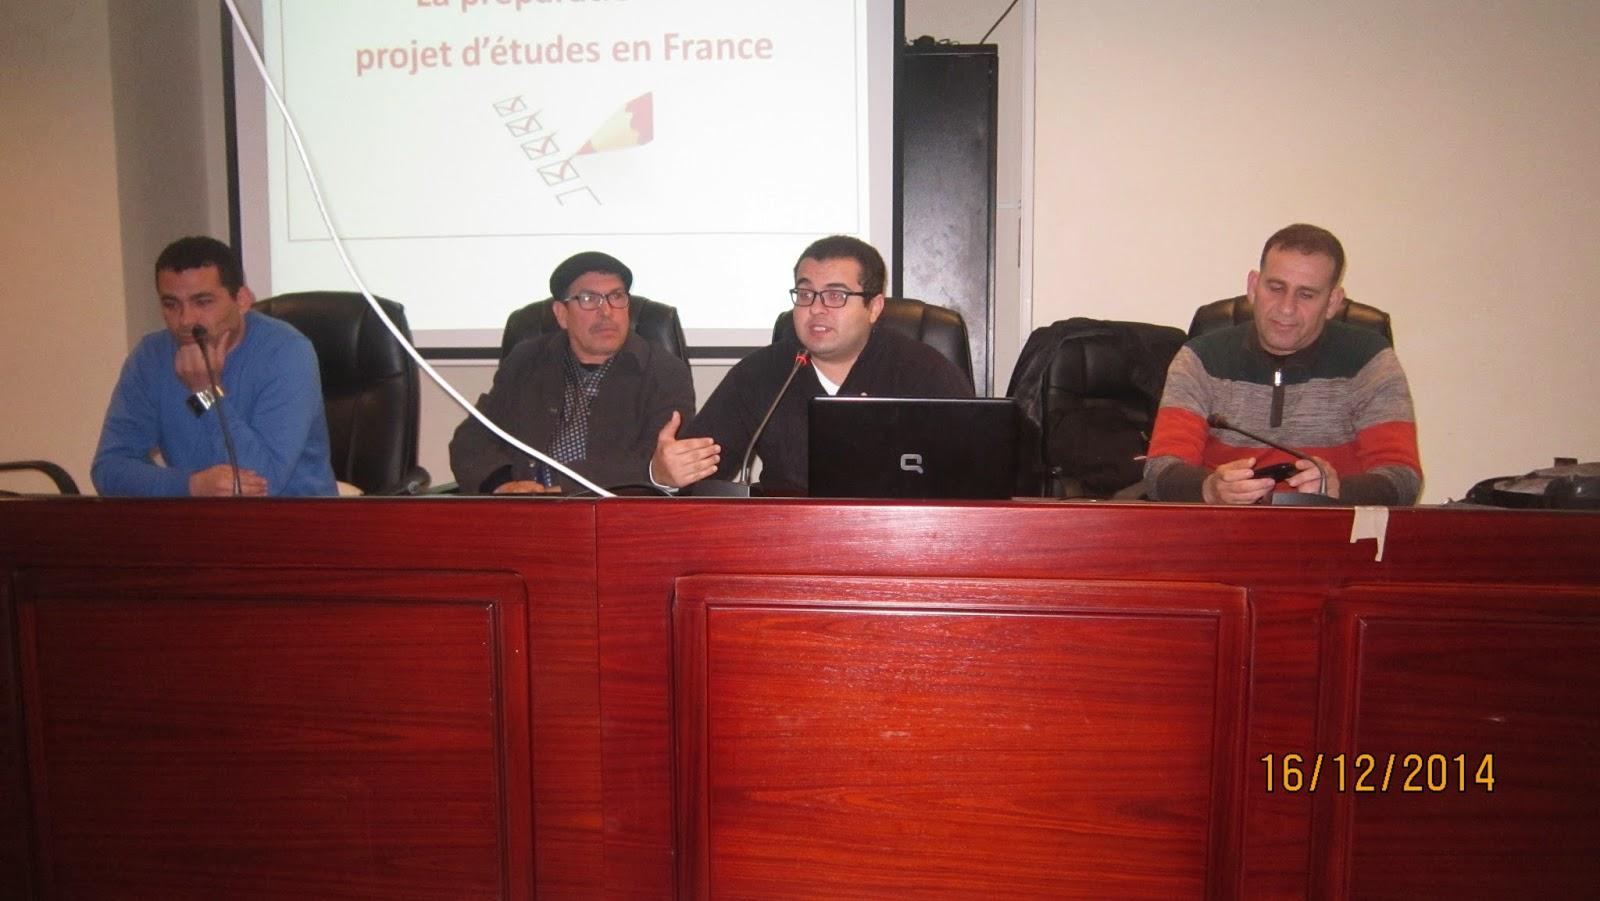 تاونات تحتضن نشاطا تربويا حول الدراسات بفرنسا